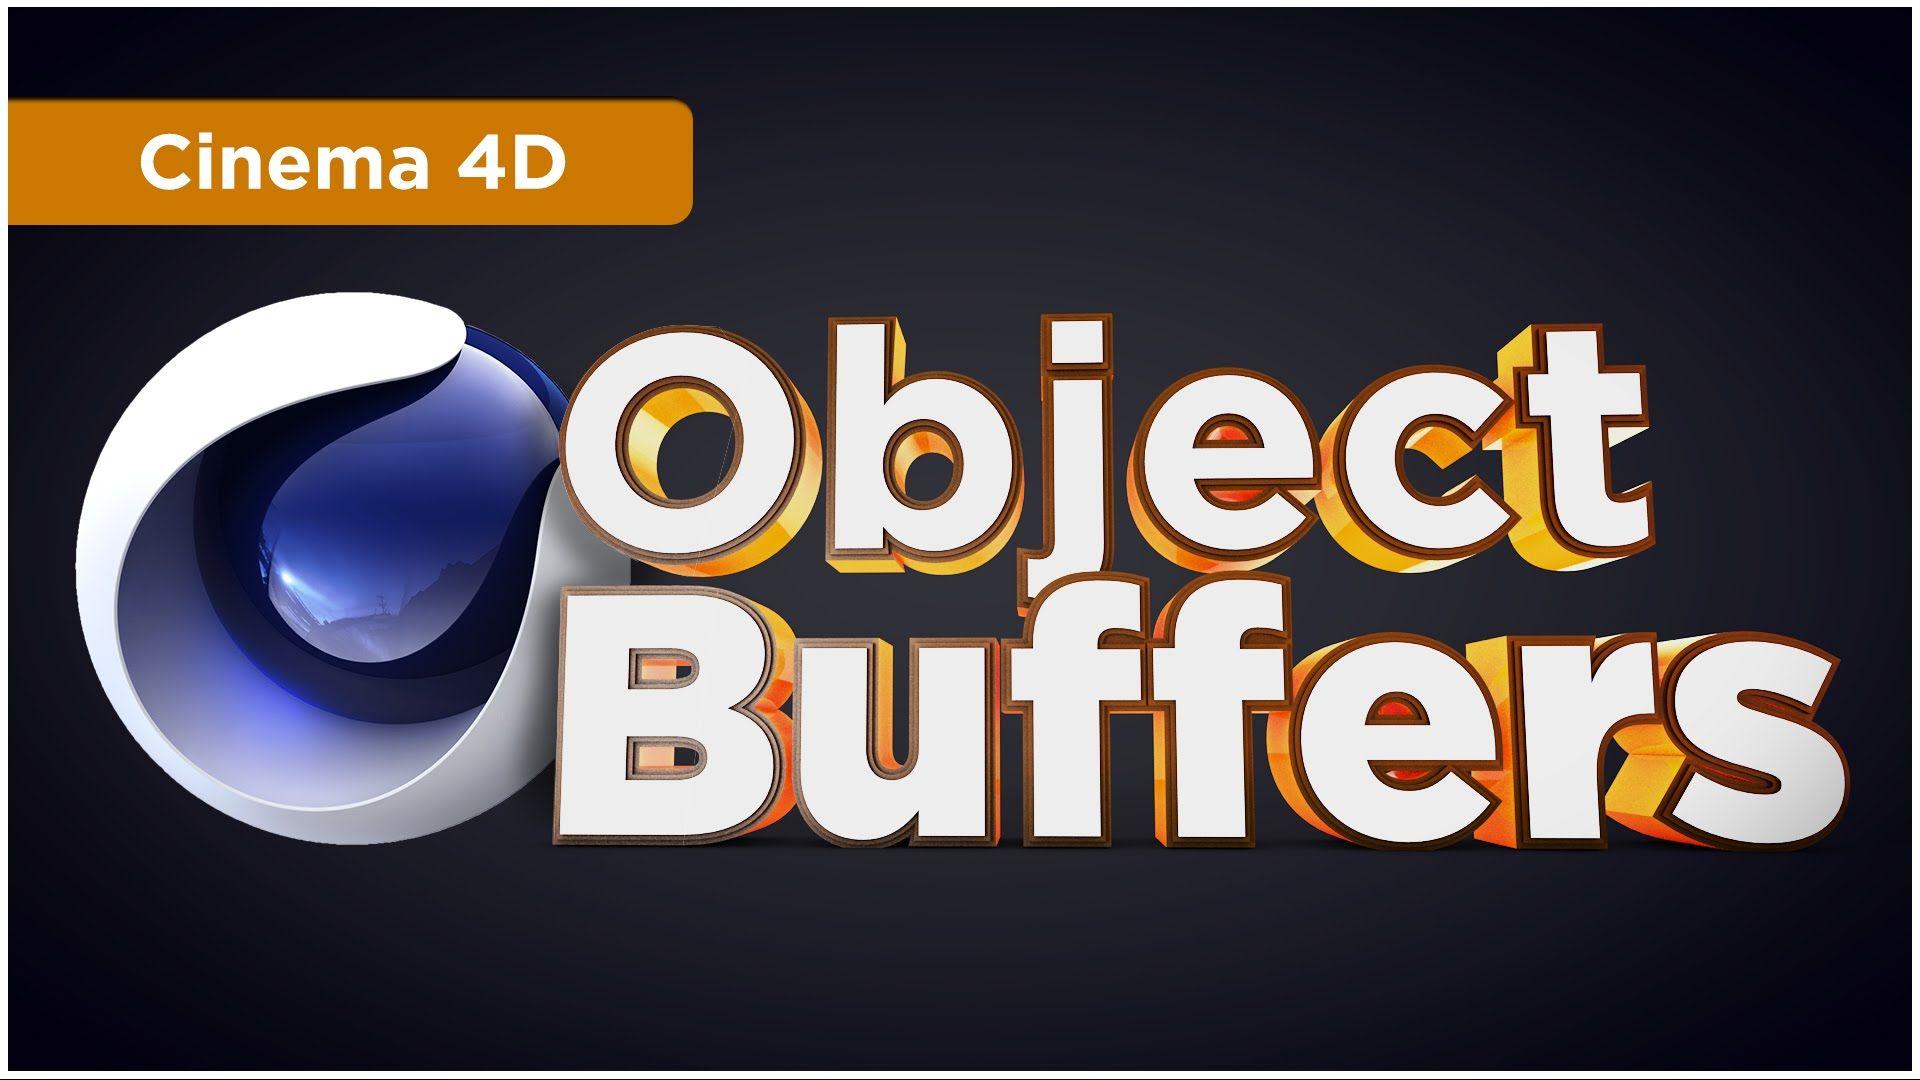 Cinema 4d object buffers create masks track mattes for how to use cinema object buffers to create masks and track mattes for post production motion tutorials baditri Choice Image